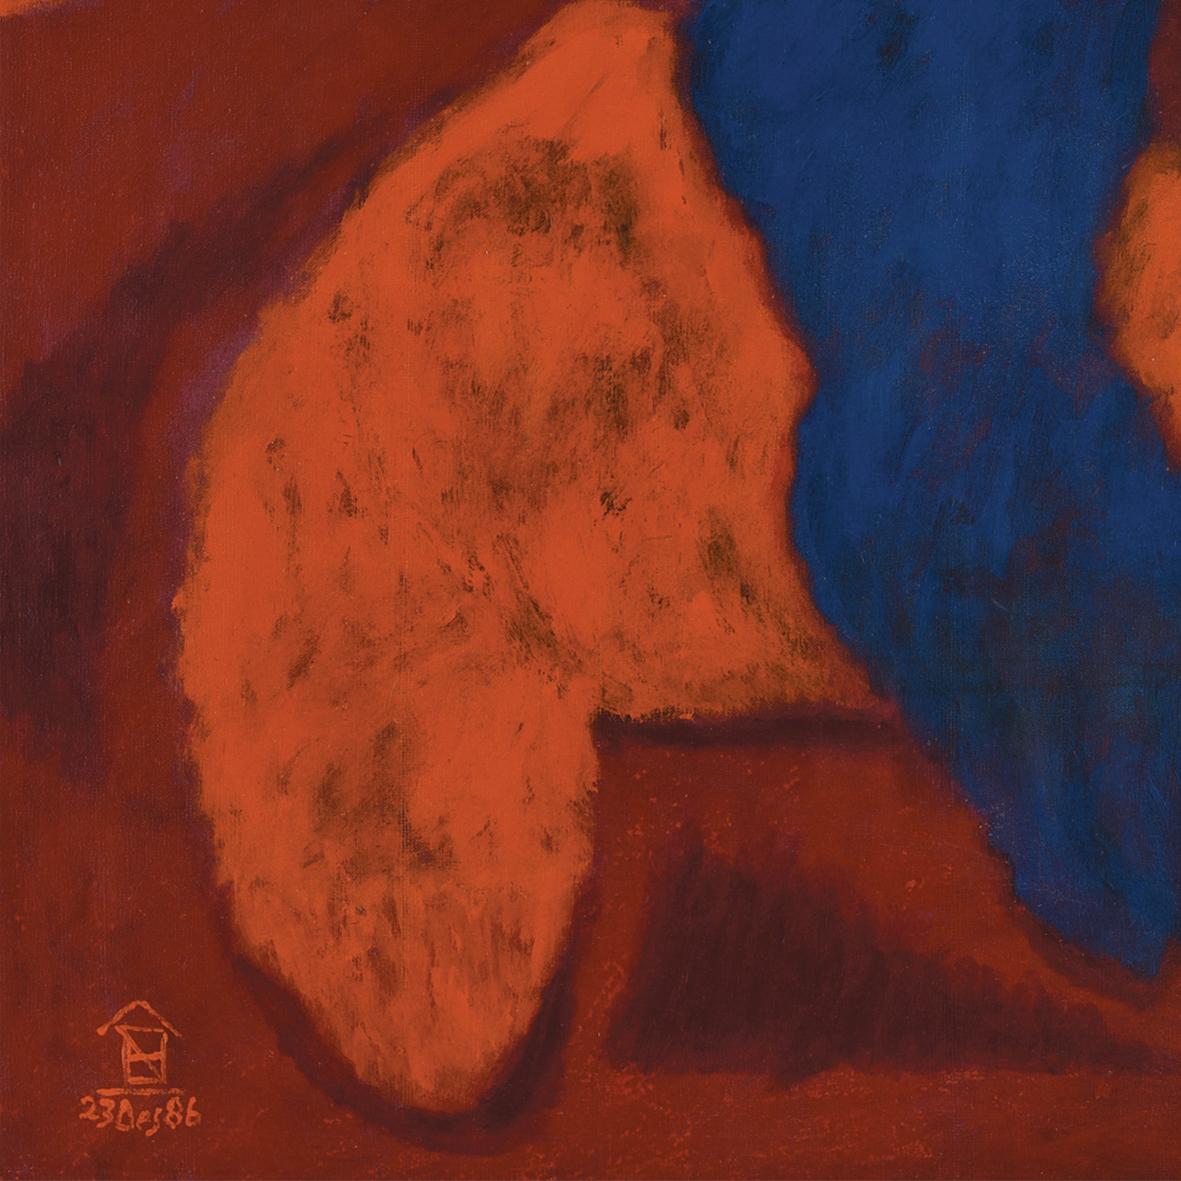 Nashar, Romance, oil on canvas, 61.5 x 89.5 cm, 1986 (detail)